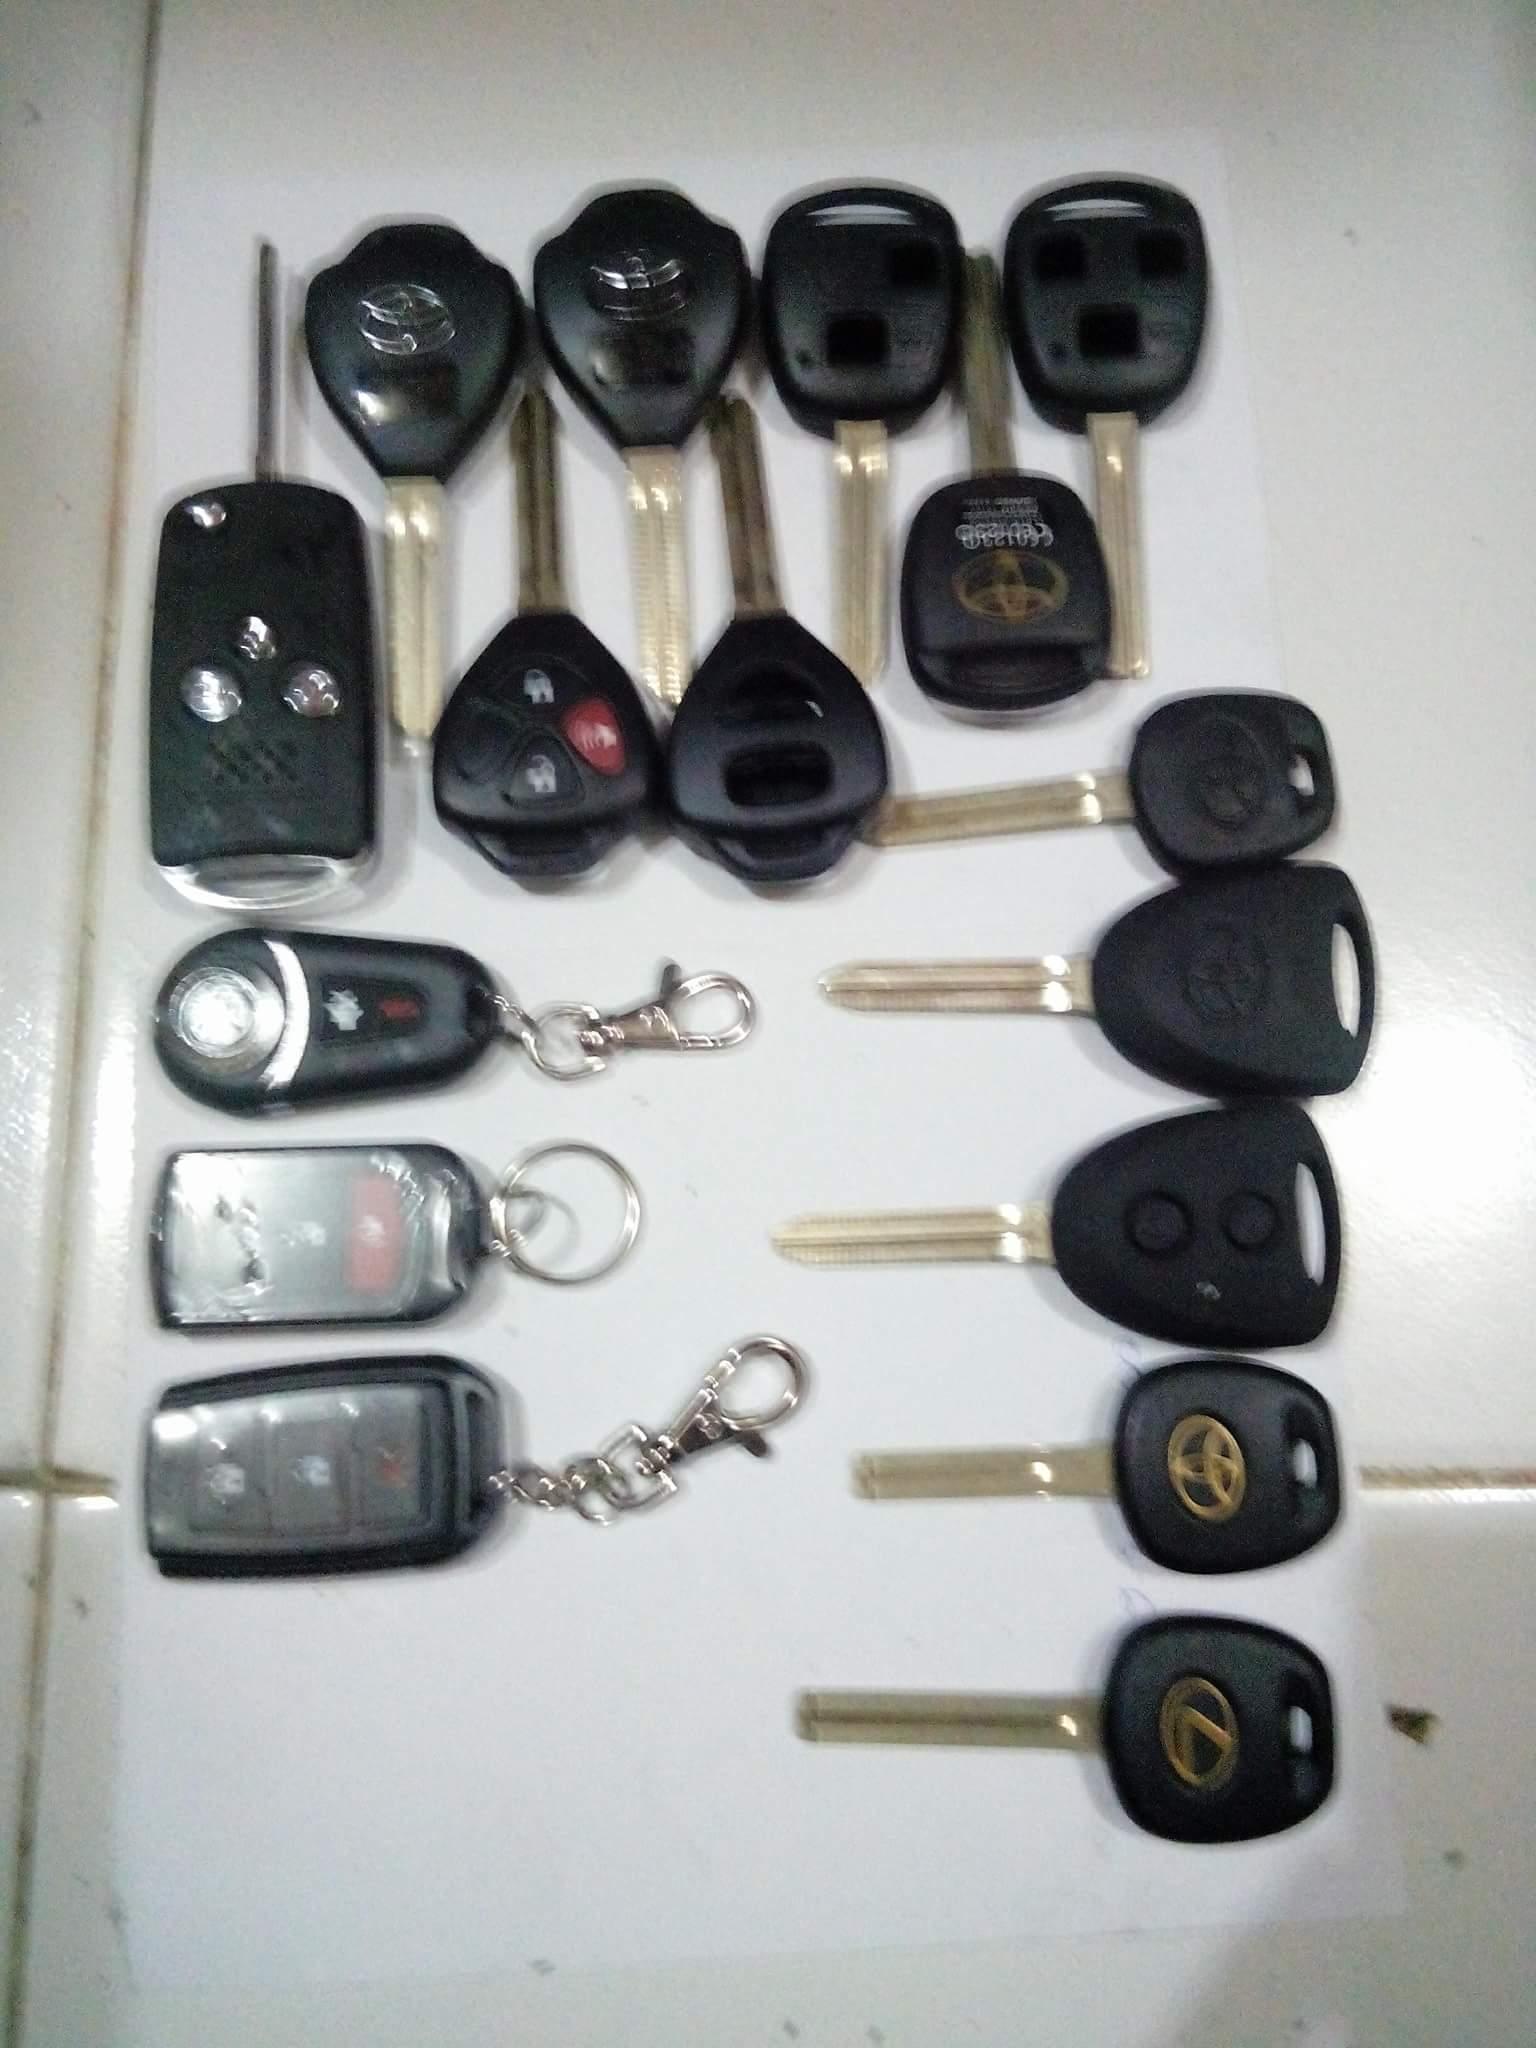 Duplicat kunci mobil immobilizer,duplicat remot mobil immobilizer,servis kunci mobil immobilizer